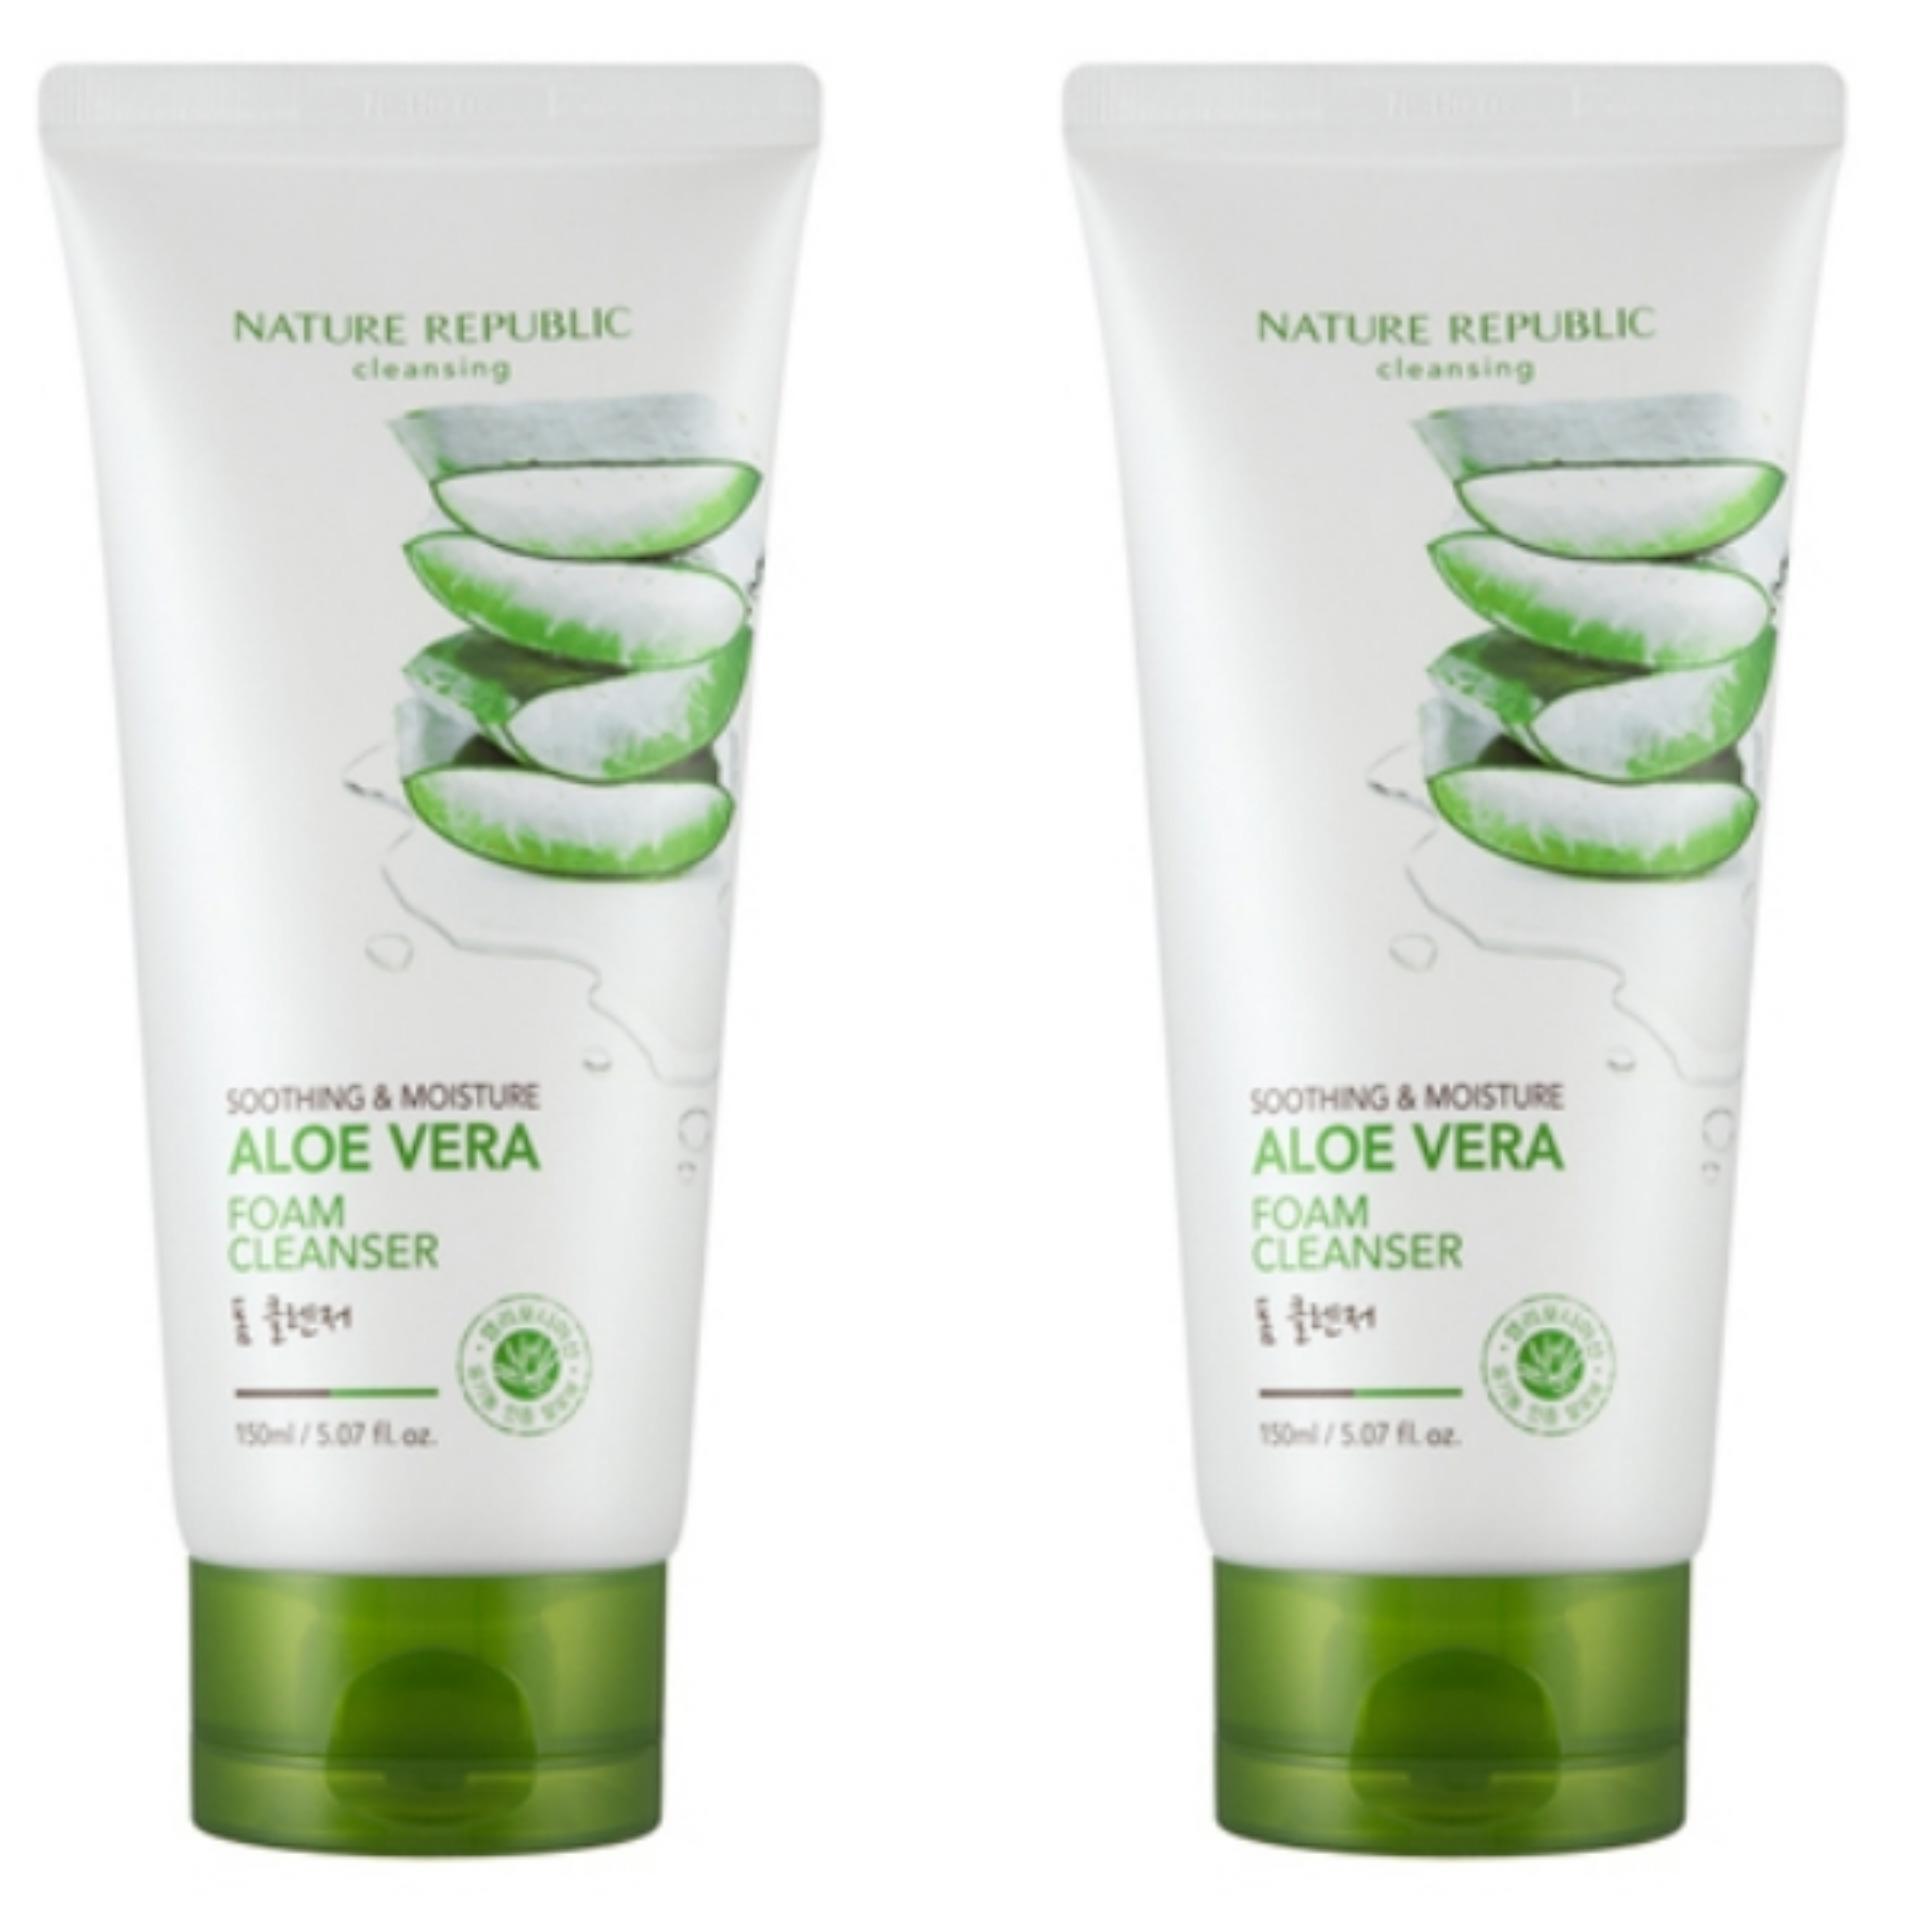 Pencari Harga Nature Republic Soothing Moisture Aloe Vera Foam Cleanser 150ml